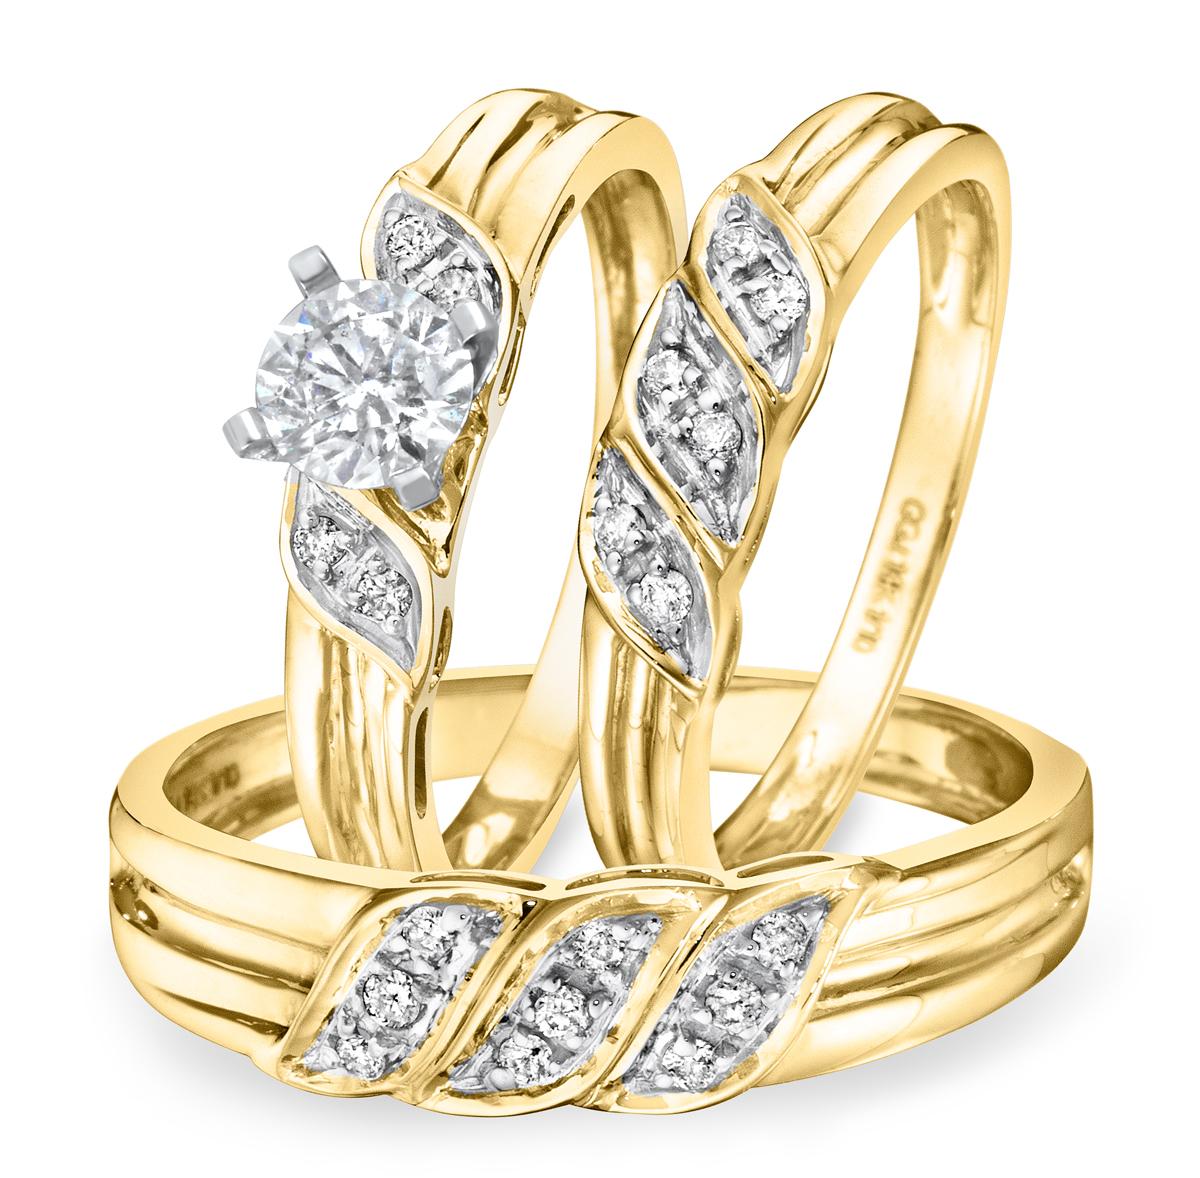 3/4 CT. T.W. Diamond Ladies Engagement Ring, Wedding Band, Men's Wedding Band